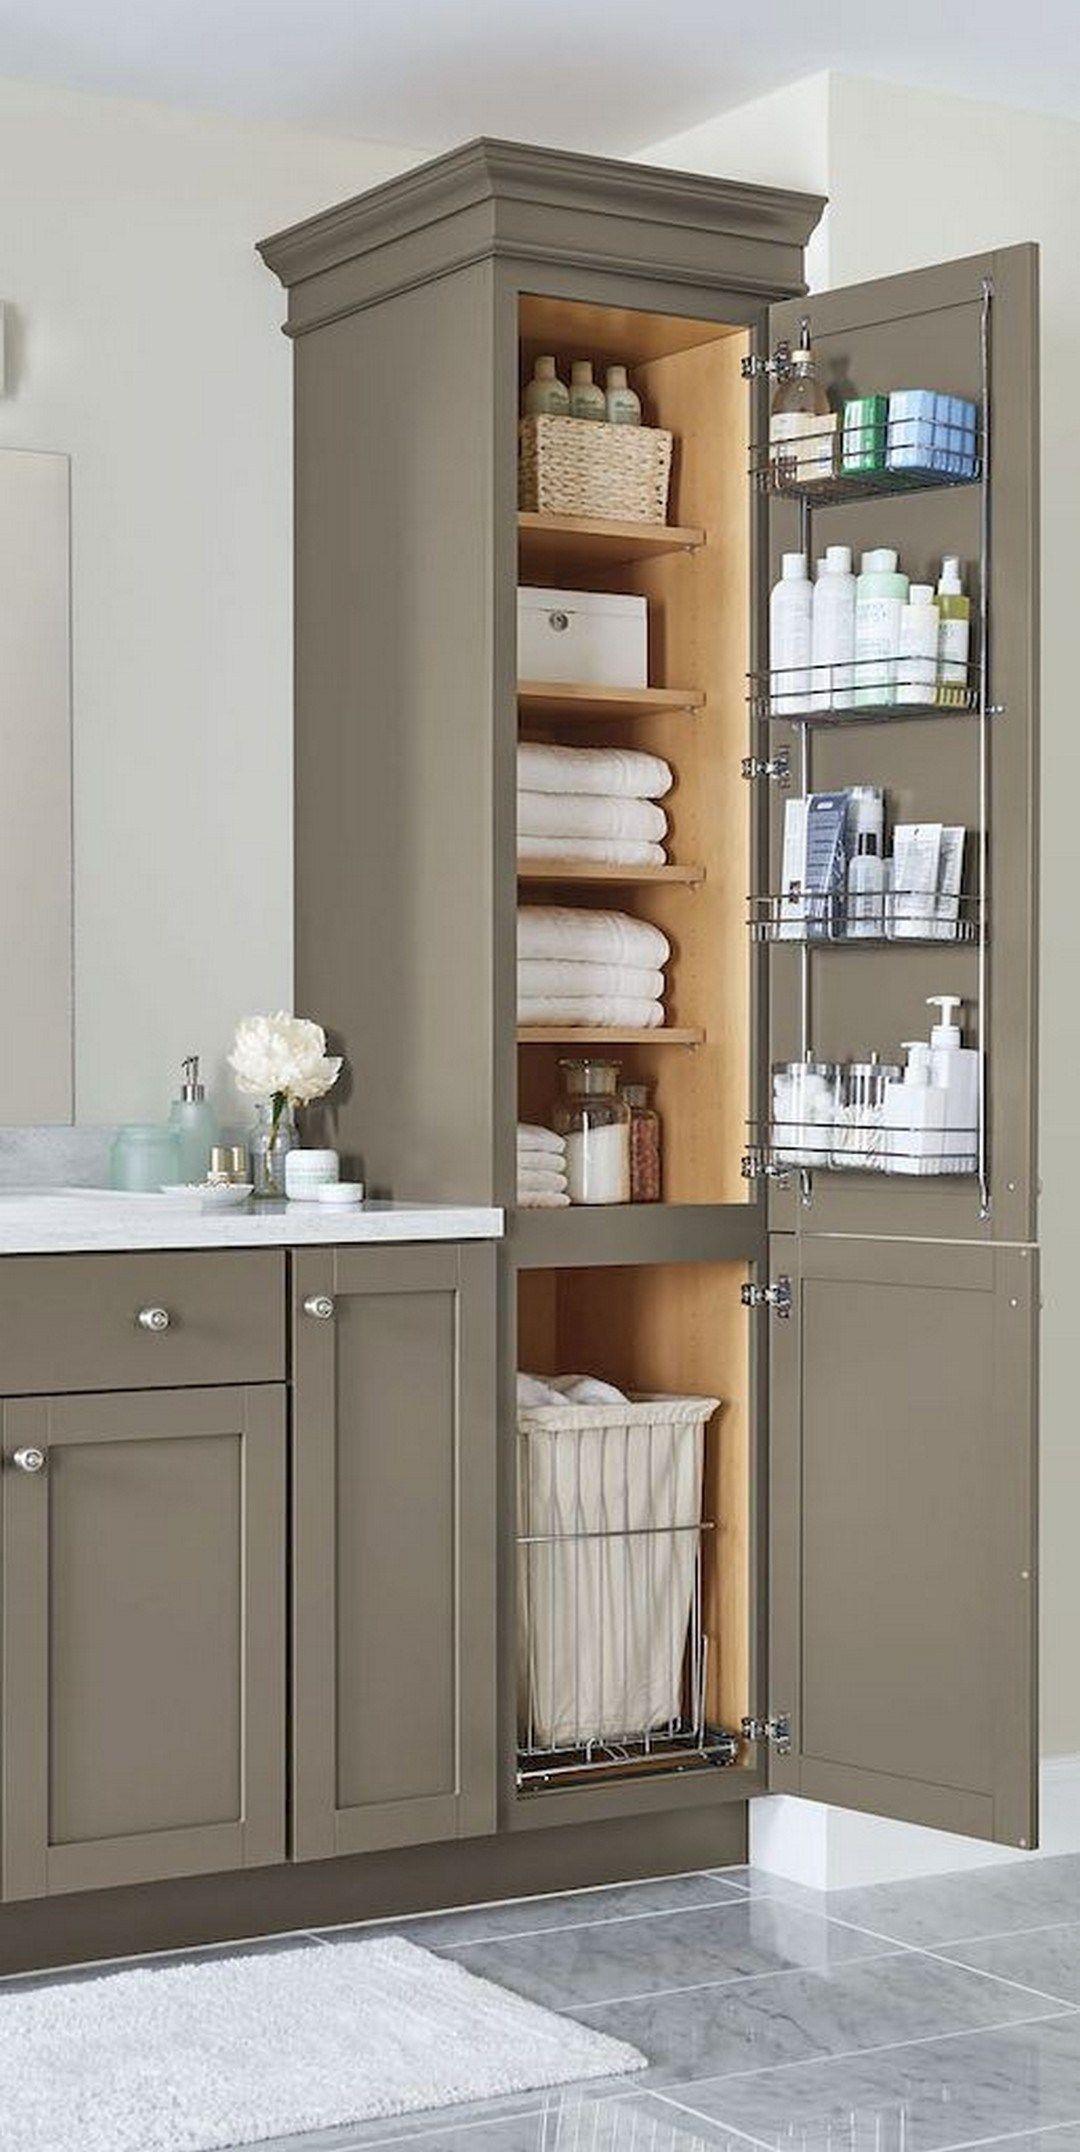 Elegant Small Bathroom Decorating Ideas 10 In 2019